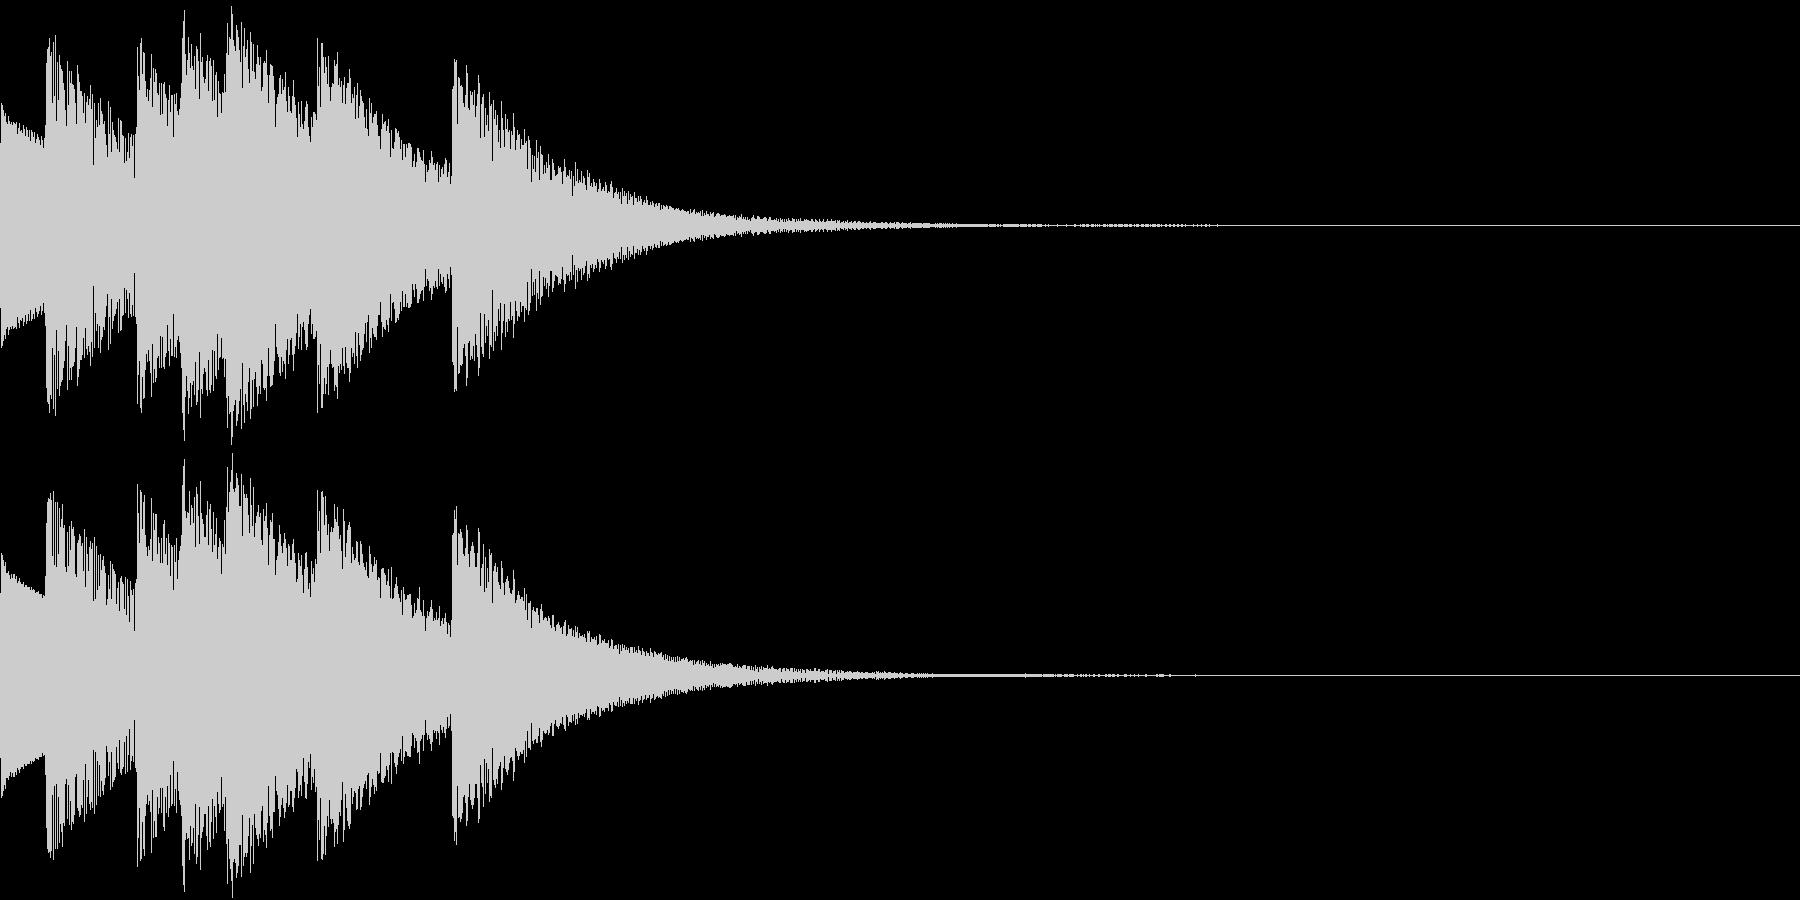 Game ダンジョン 魔法のハープの音の未再生の波形